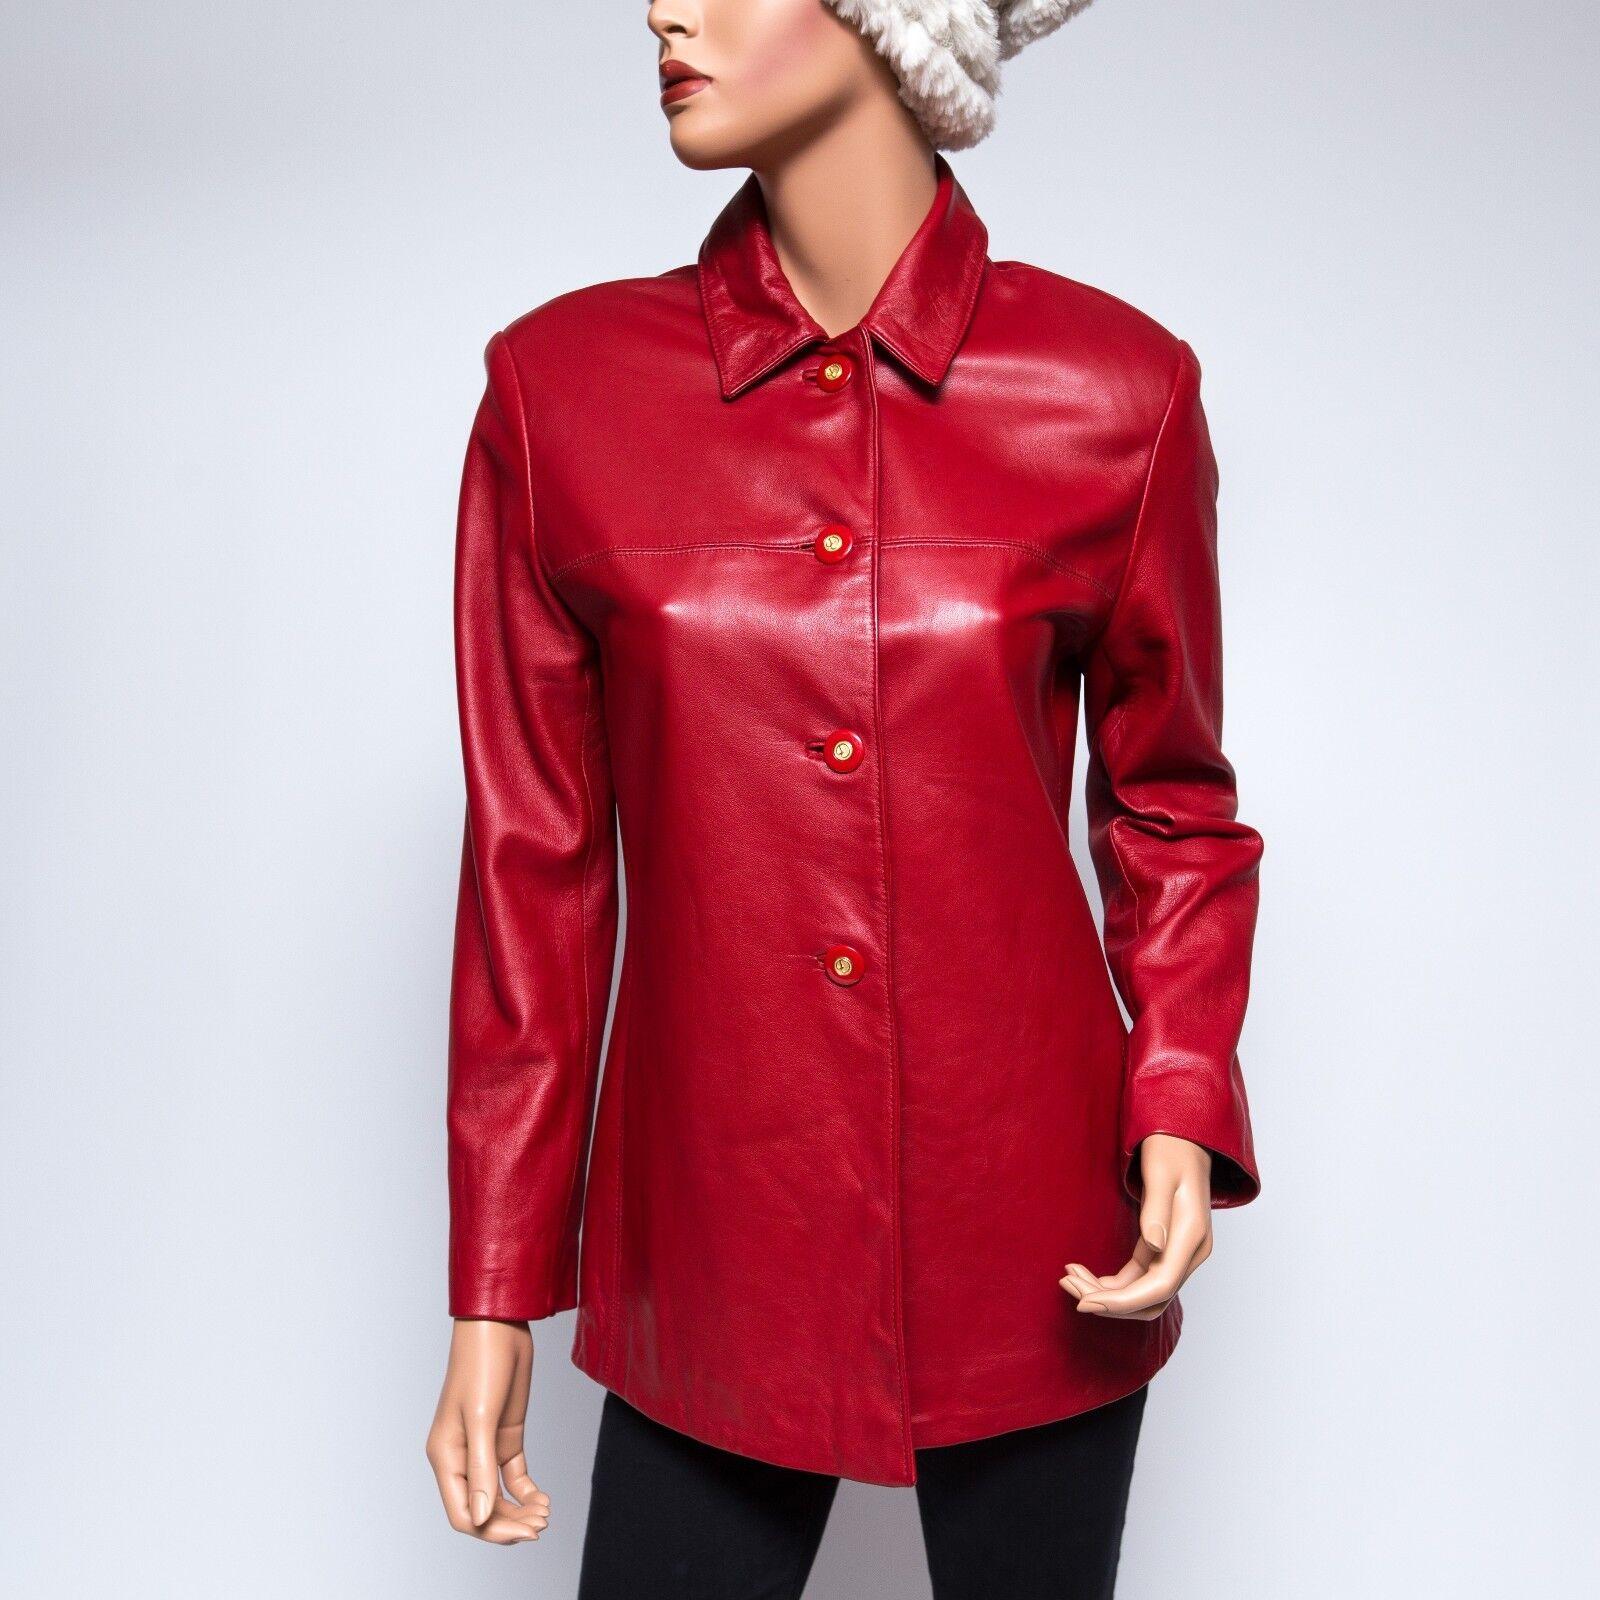 St  John Sport Abrigo De Cuero Genuino Rojo Forrado Petite Pequeña  2800  marcas en línea venta barata